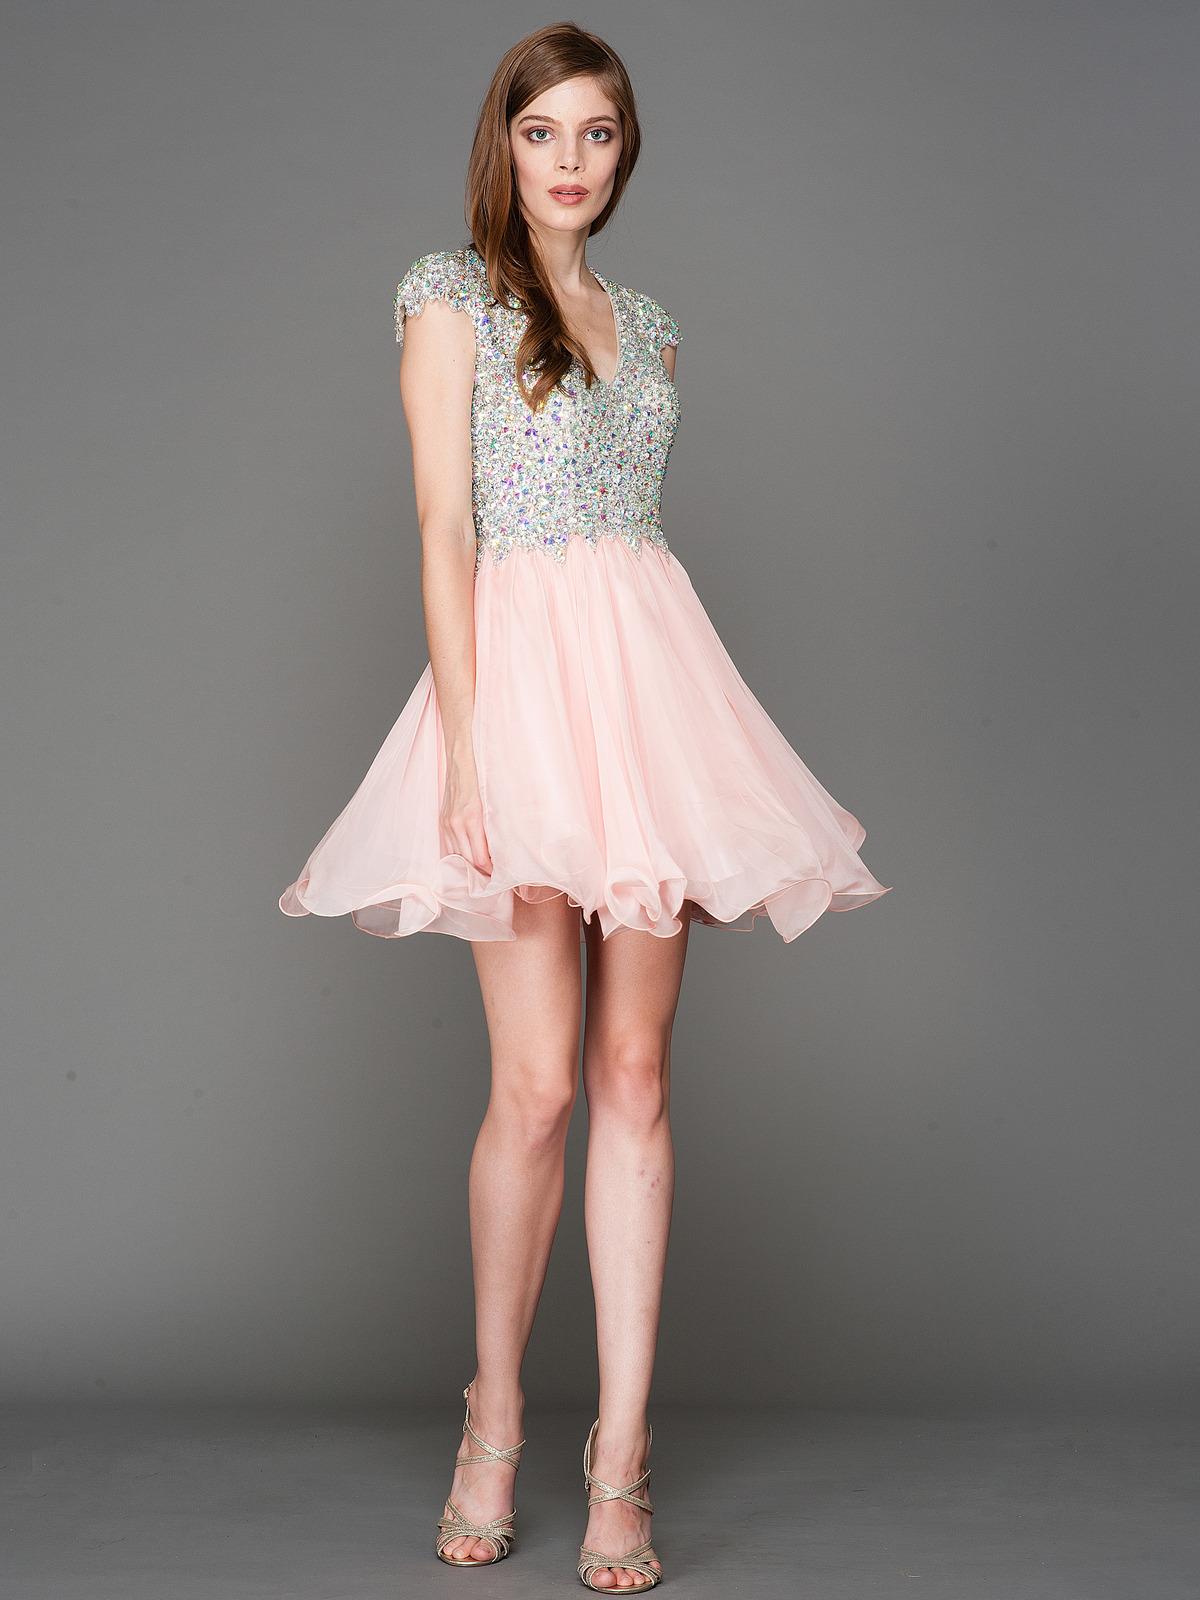 Short Black Homecoming Dresses